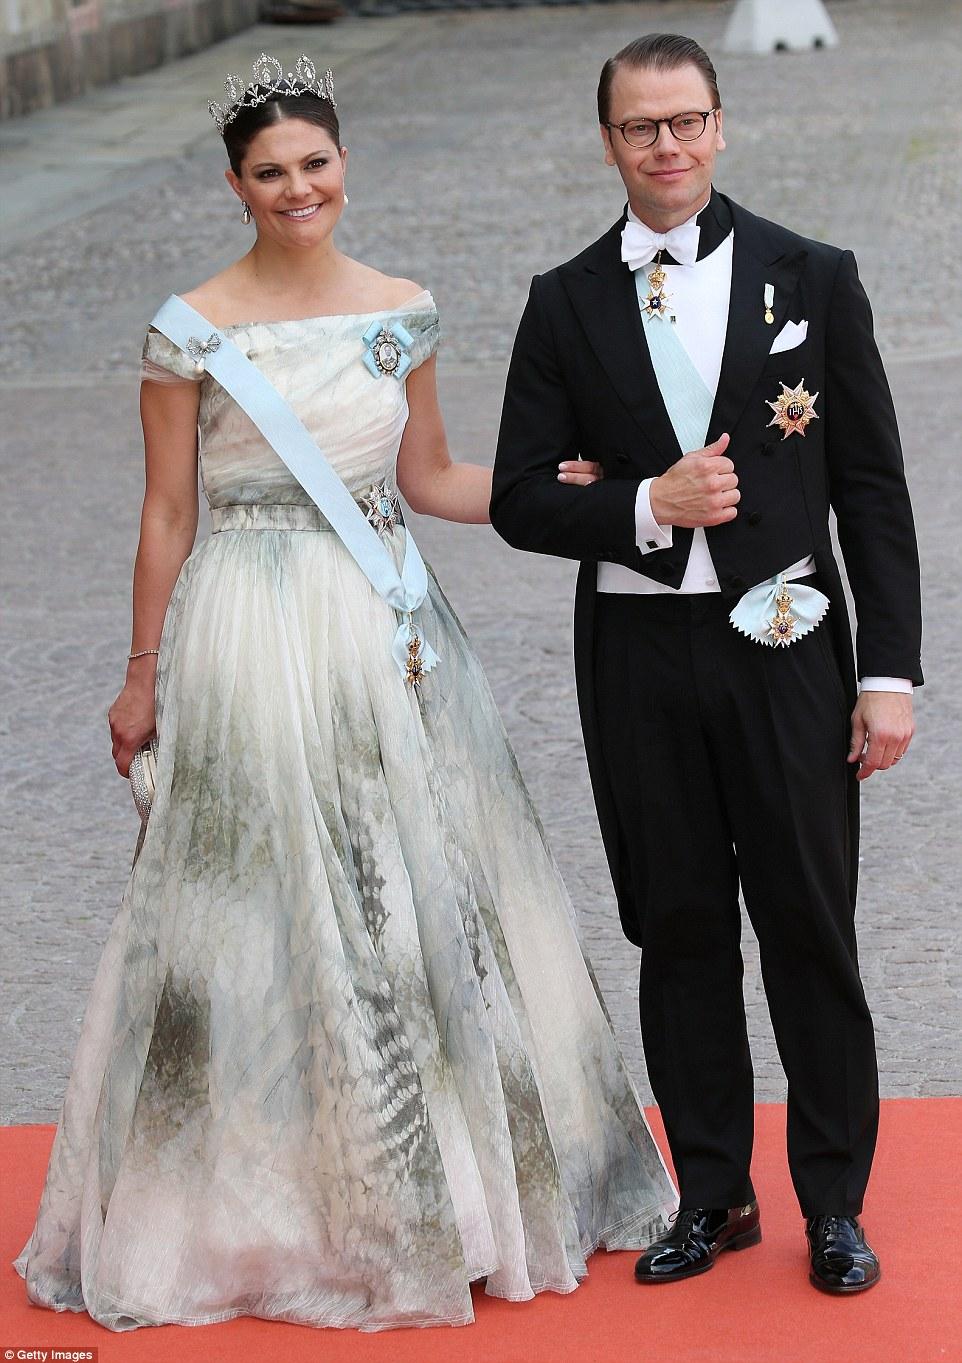 Carl Philip's eldest sister, Crown Princess Victoria of Sweden, and her husband Prince Daniel of Sweden smile for the camera